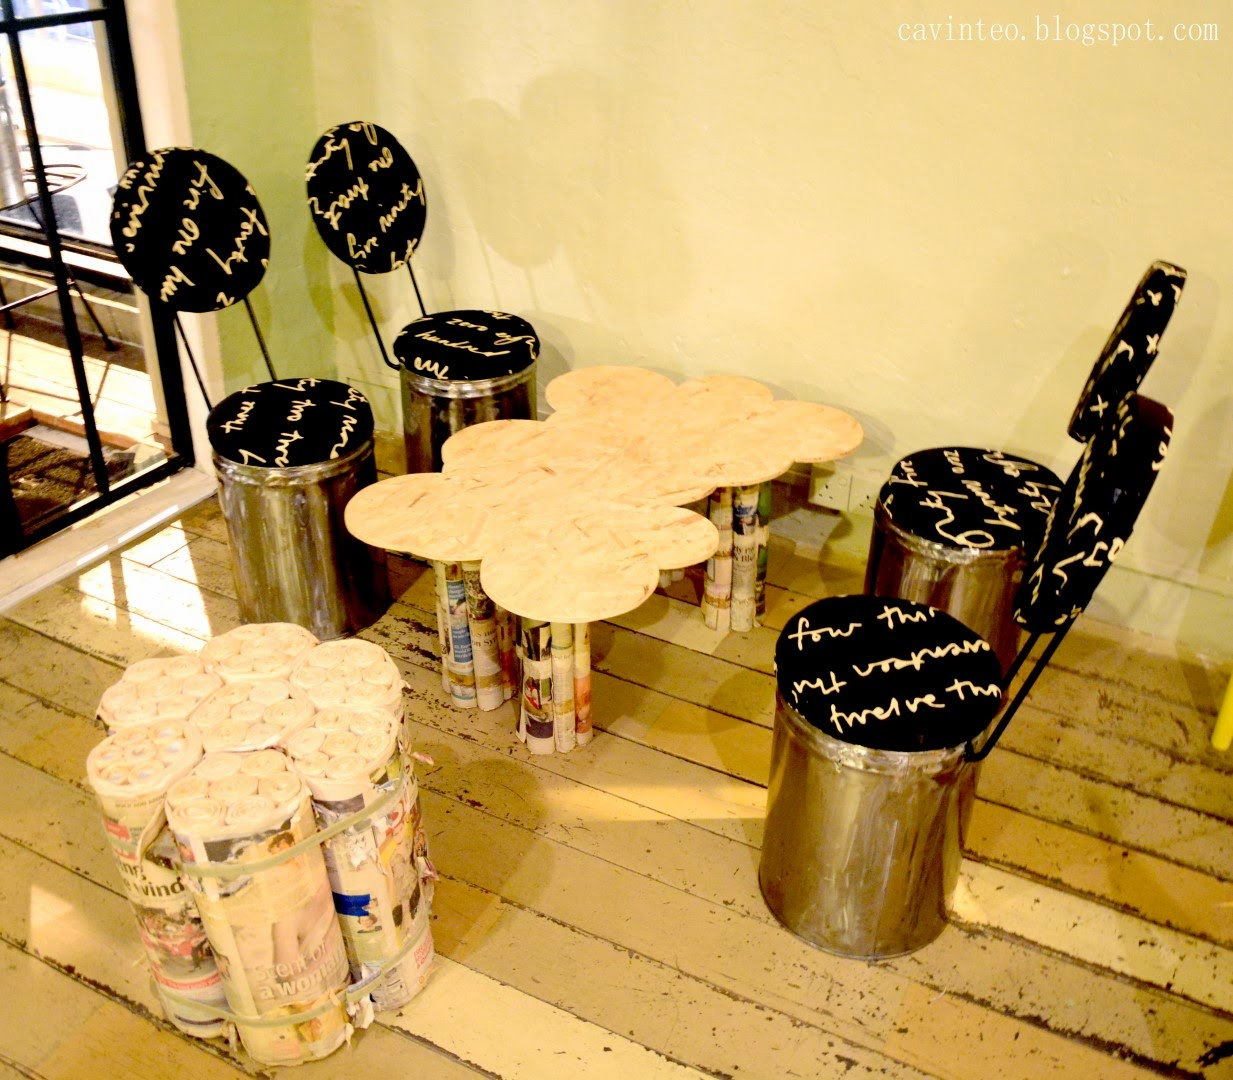 entree kibbles: kafe roost - the eco friendly concept @ johor